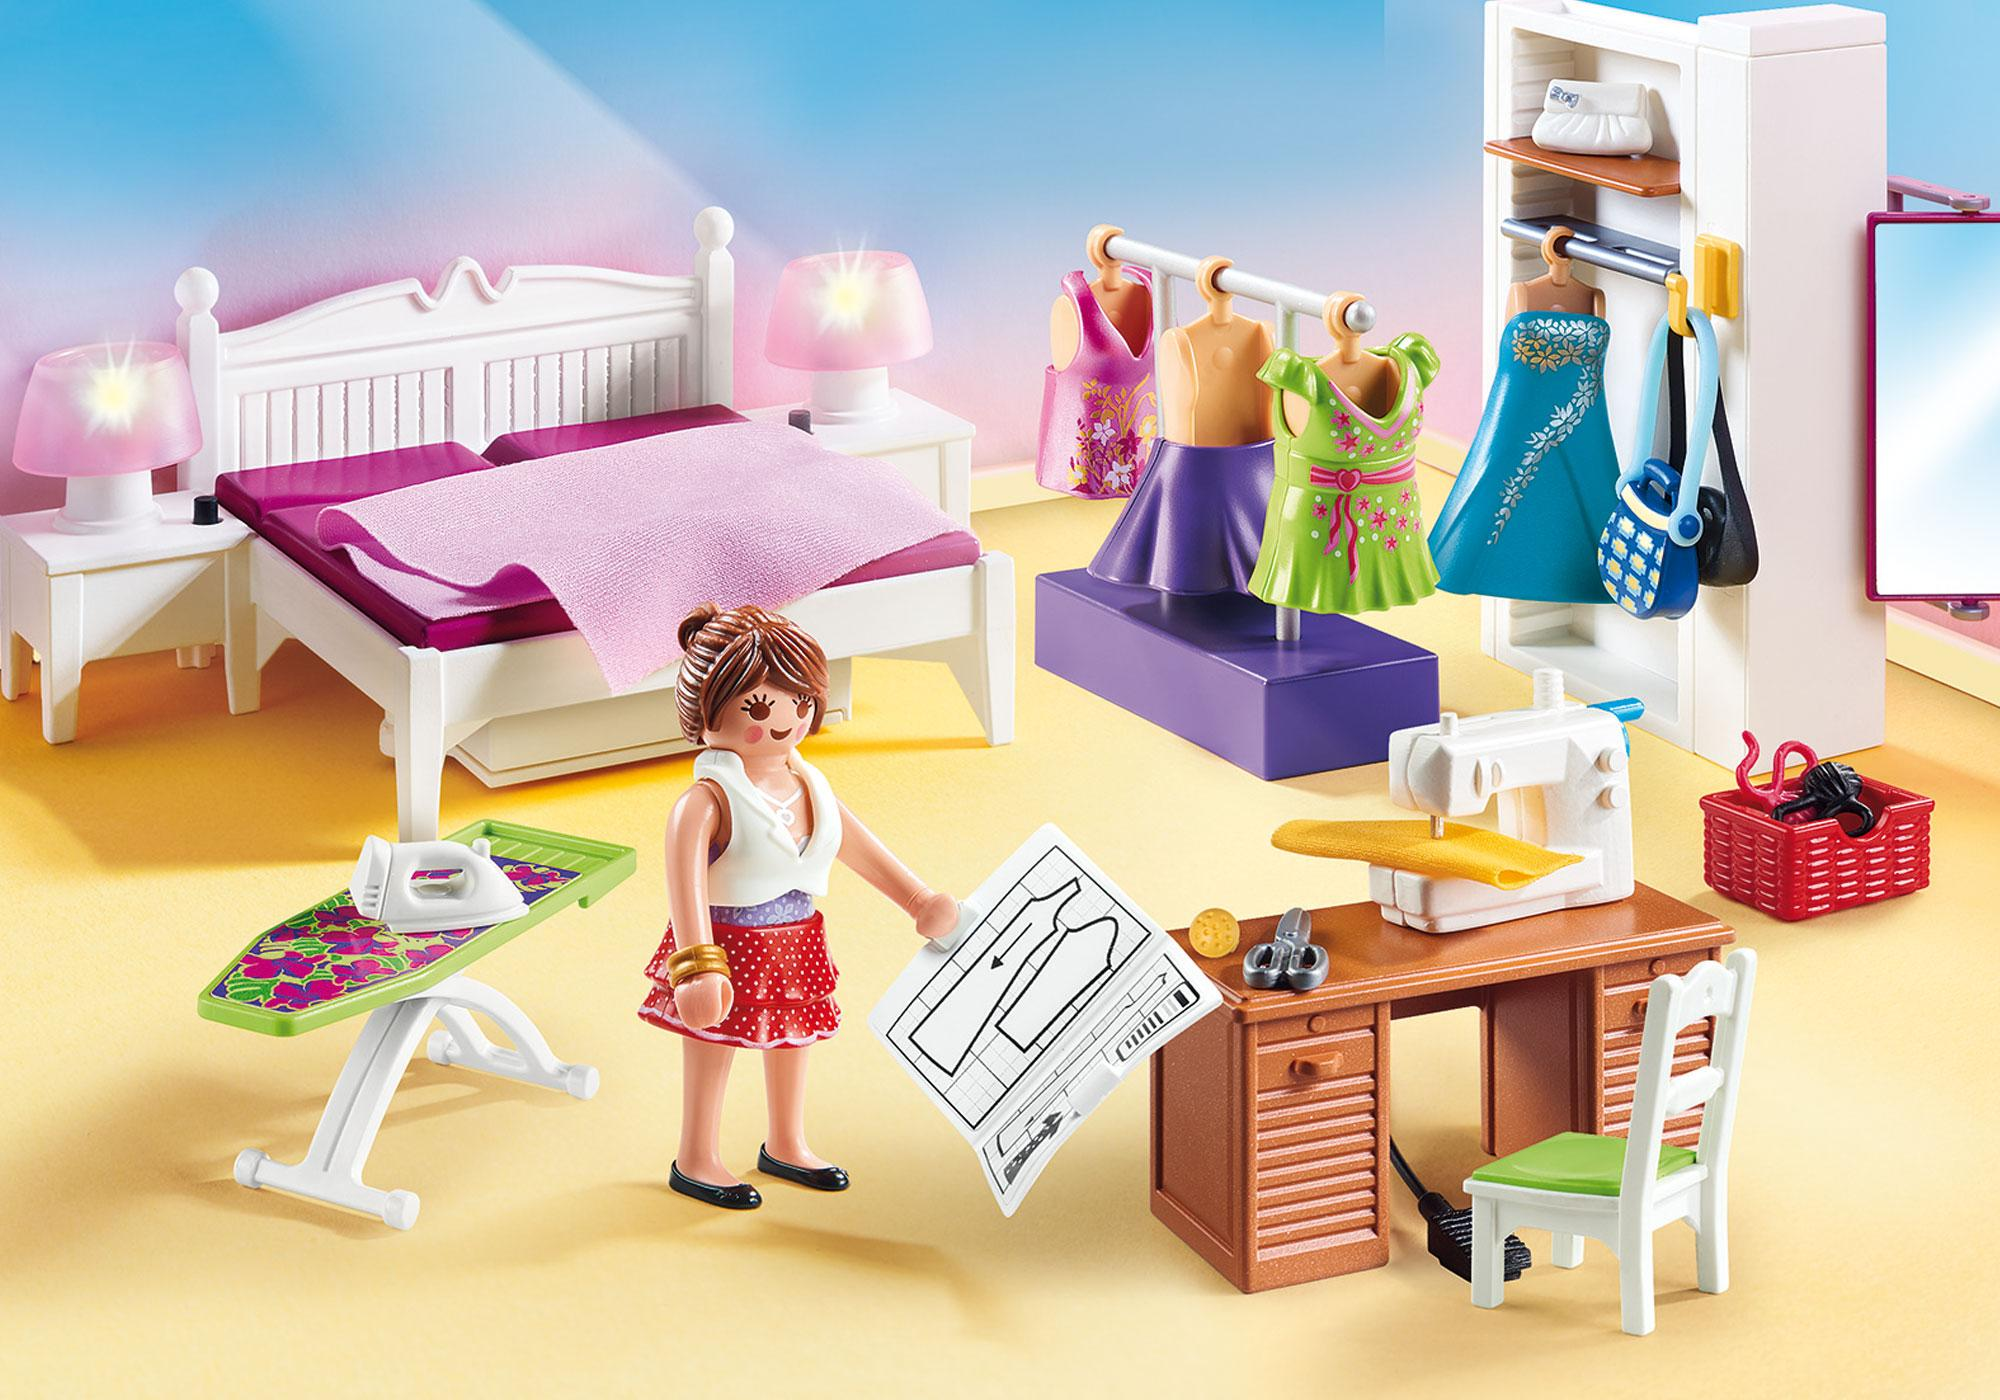 http://media.playmobil.com/i/playmobil/70208_product_detail/Schlafzimmer mit Nähecke